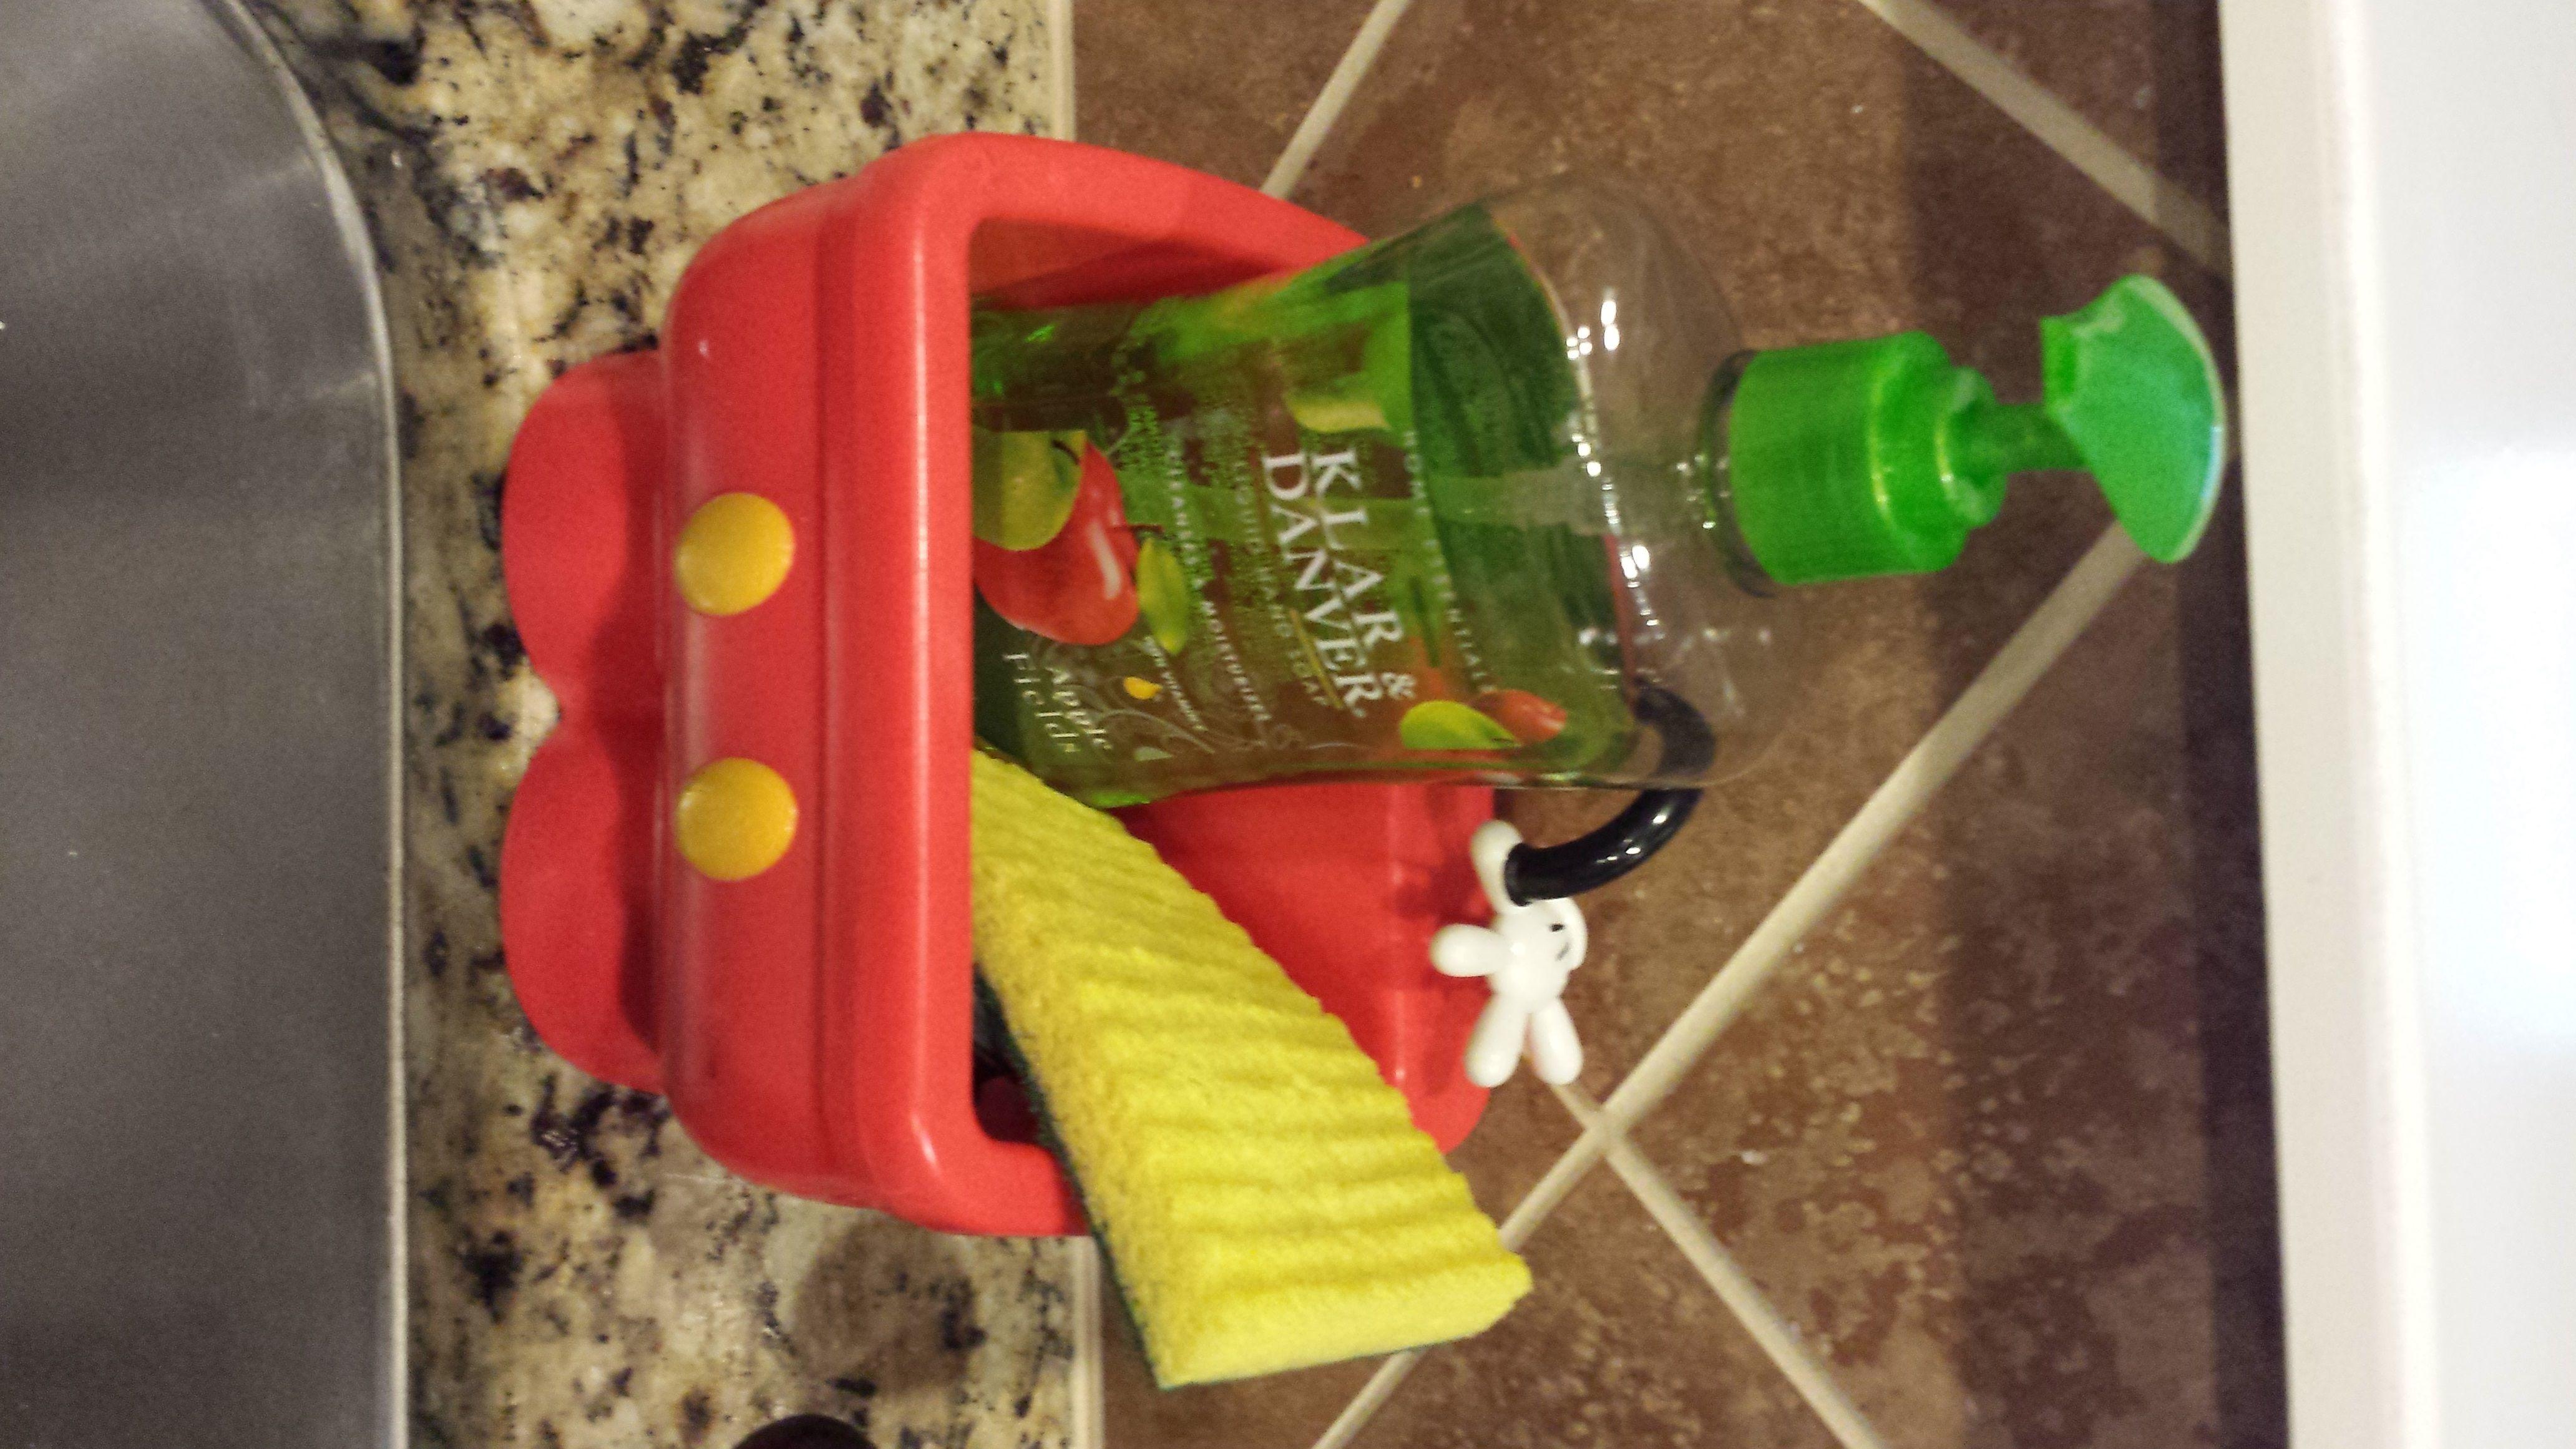 Mickey Mouse Kitchen Sink Bowl Ideas Google Search Mickey Mouse Kitchen Kitchen Sink Bowl Kitchen Sink